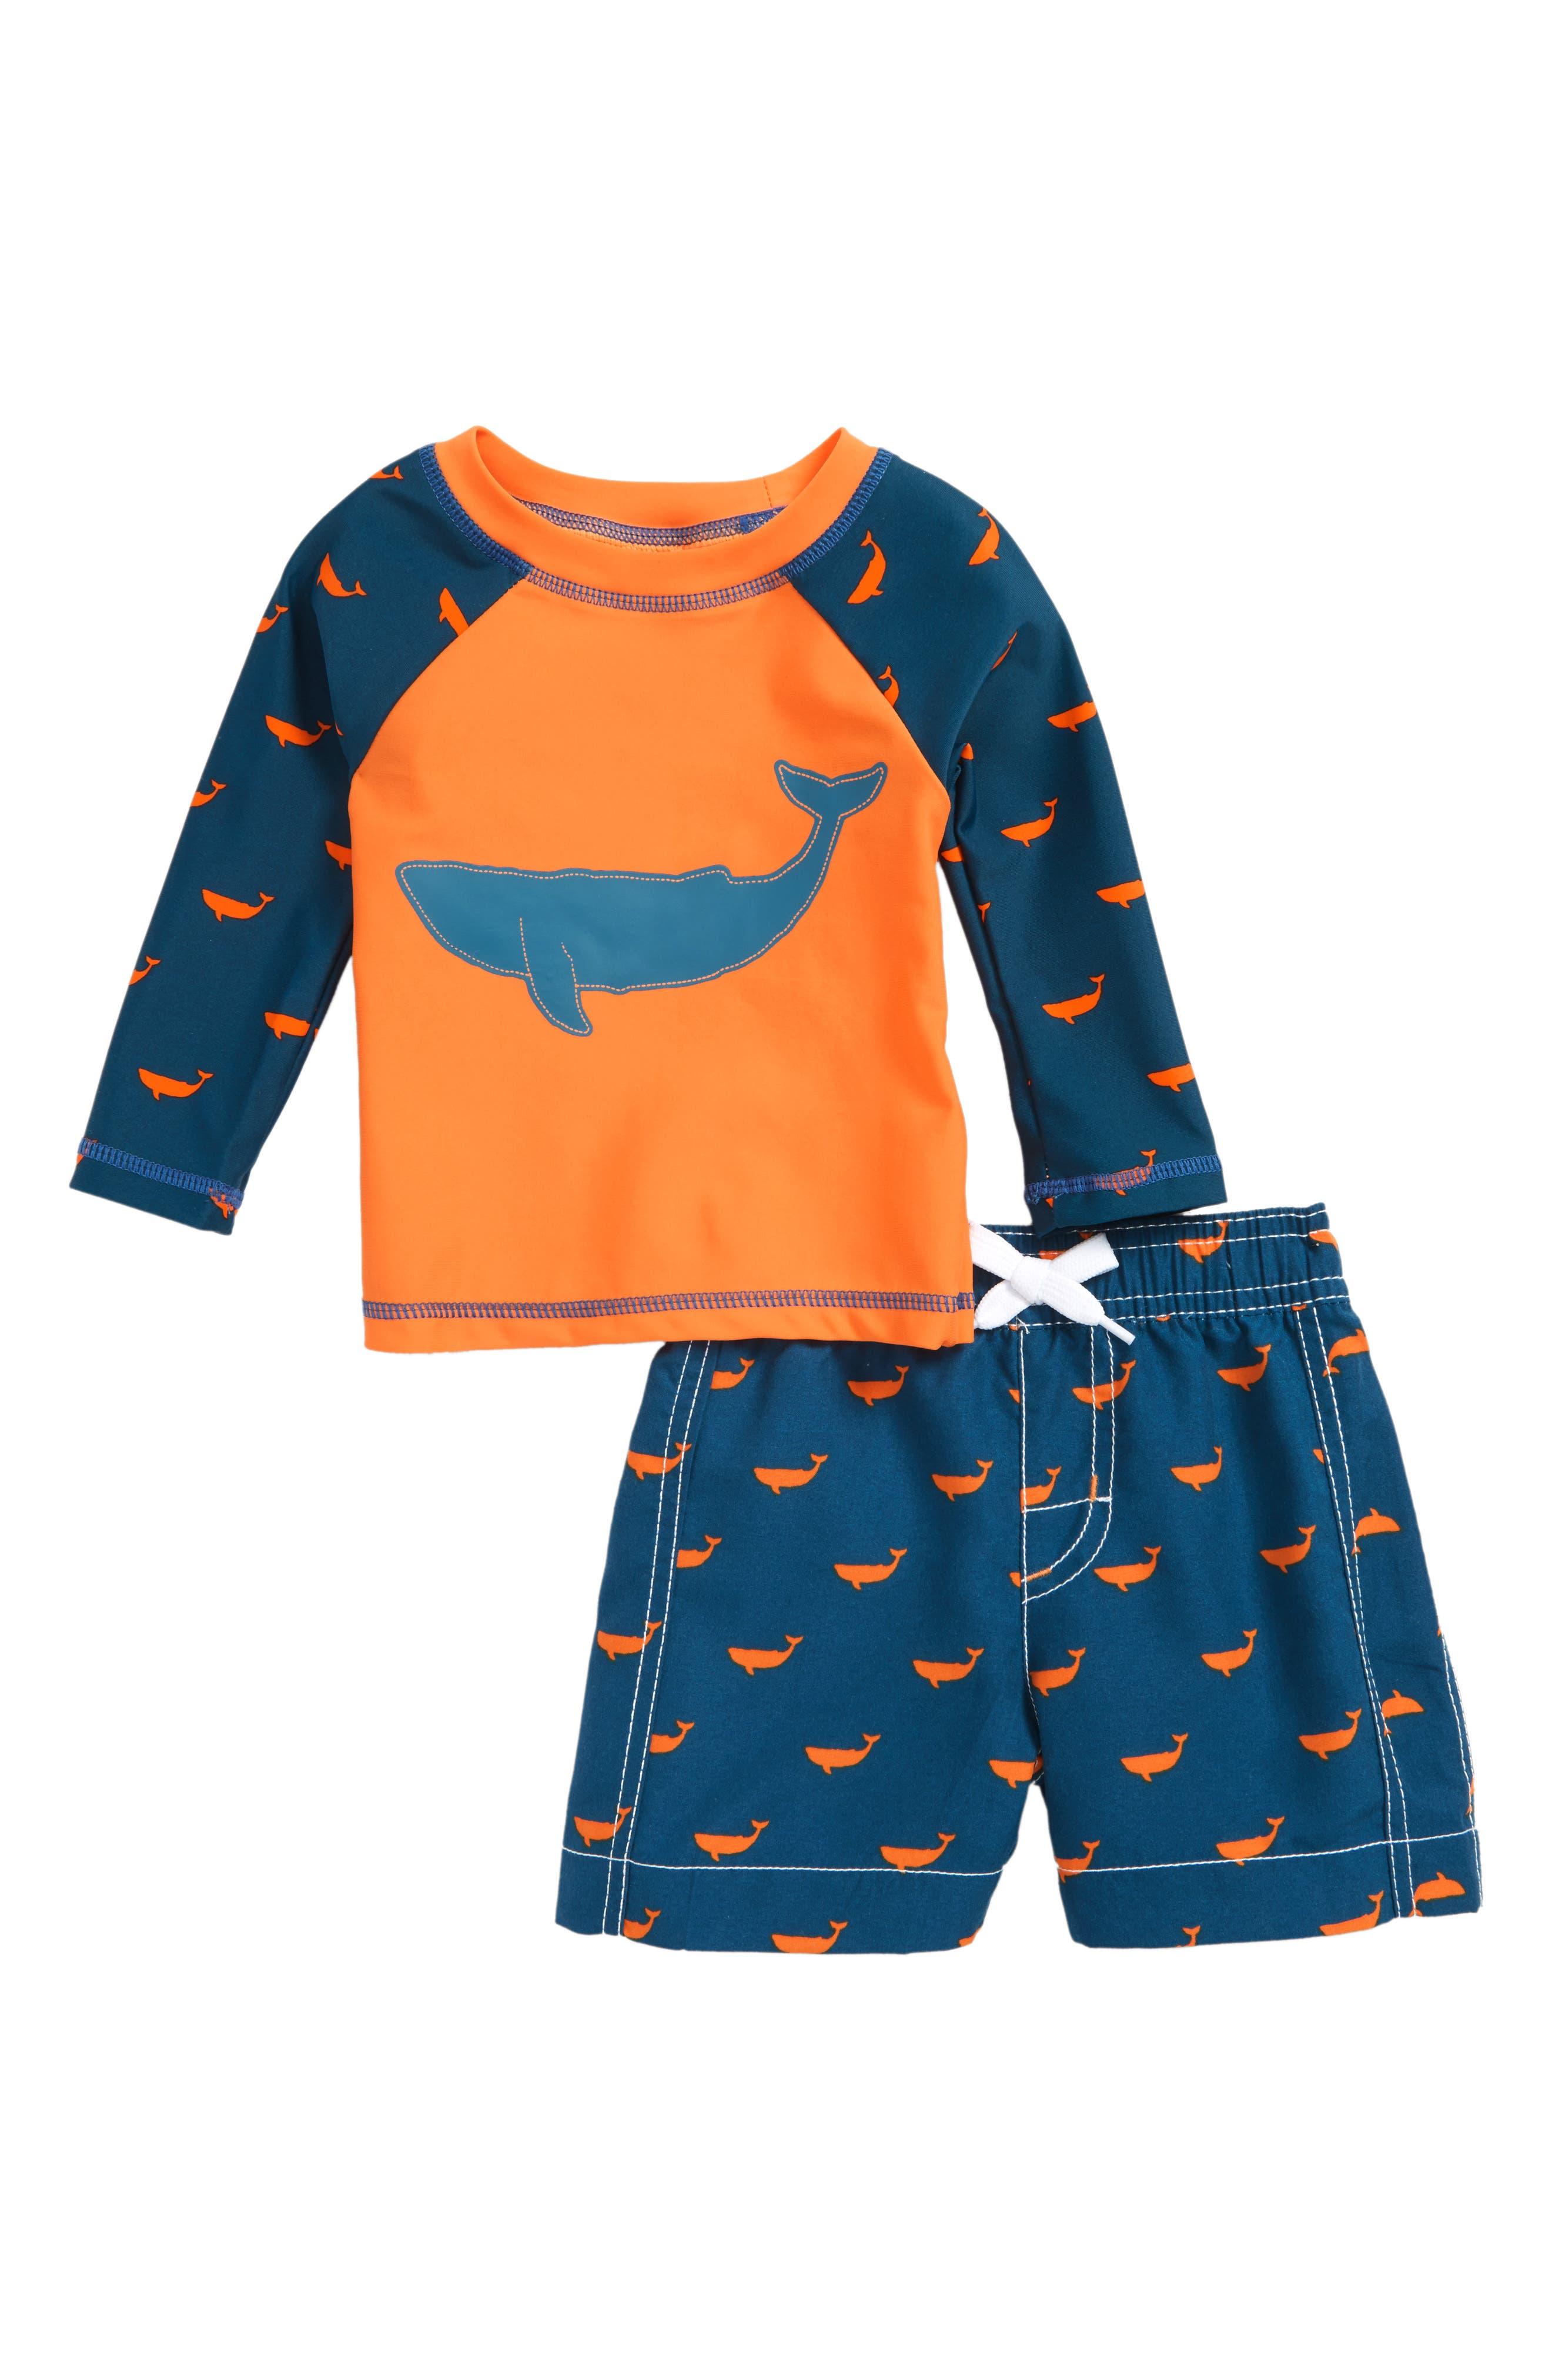 Hatley Long Sleeve Rashguard & Swim Trunks Set (Baby Boys)